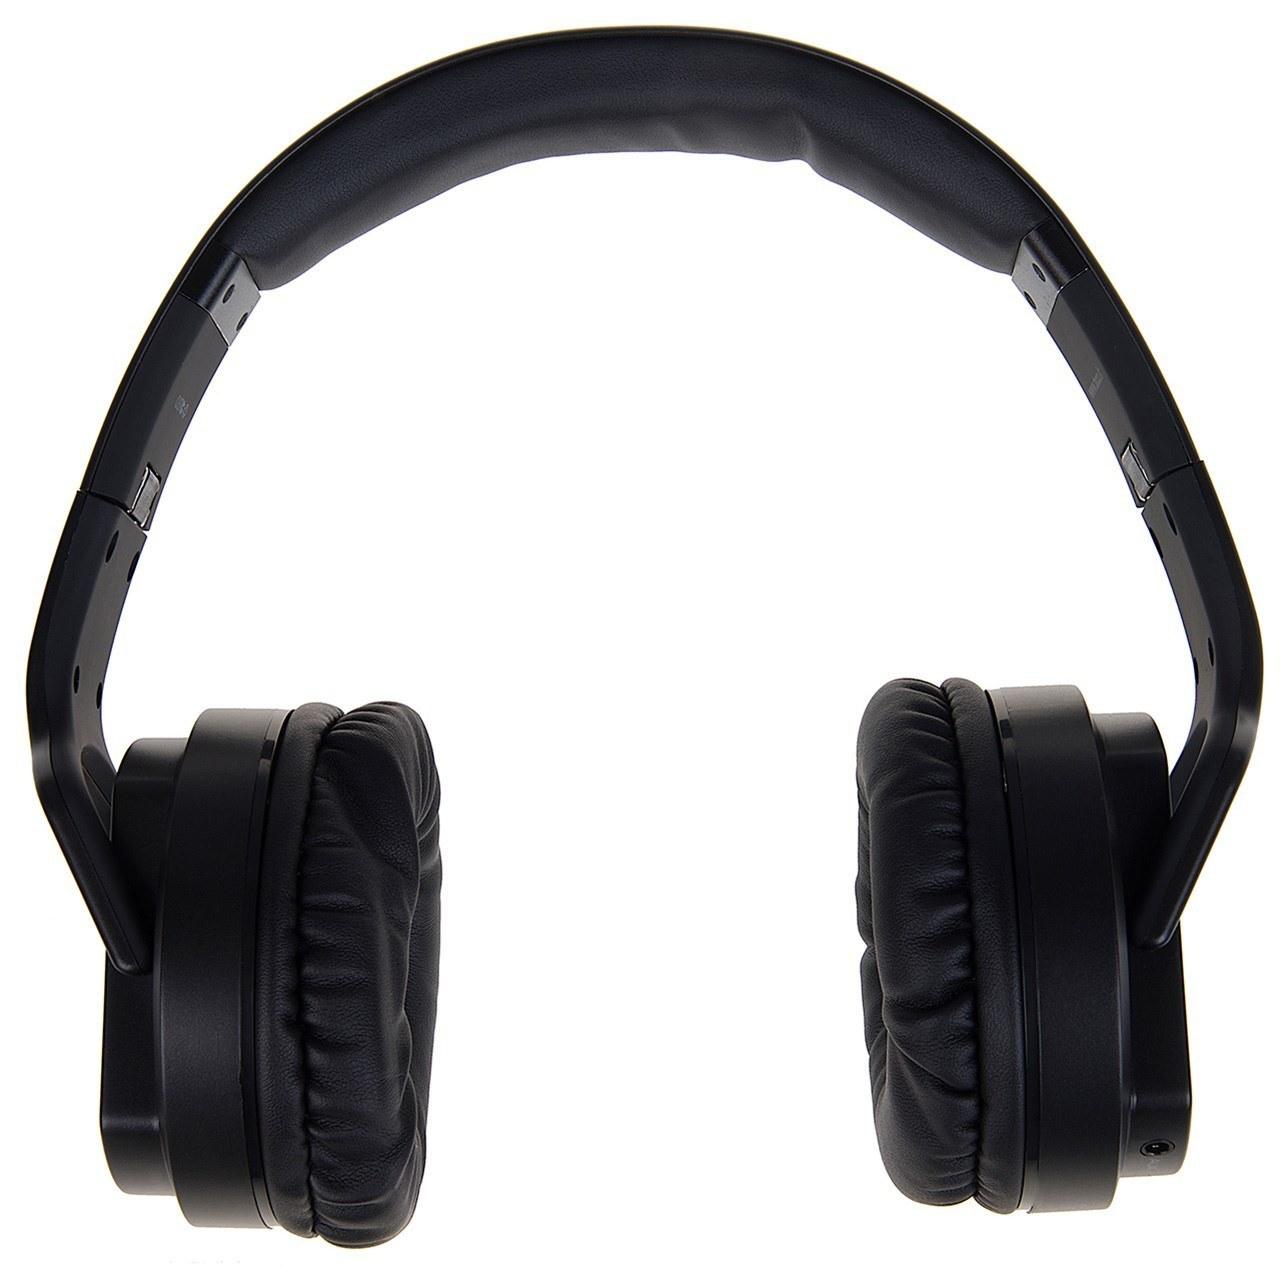 تصویر هدفون بی سیم تسکو مدل TH 5323 Tesco Wireless Headphones Model TH 5323